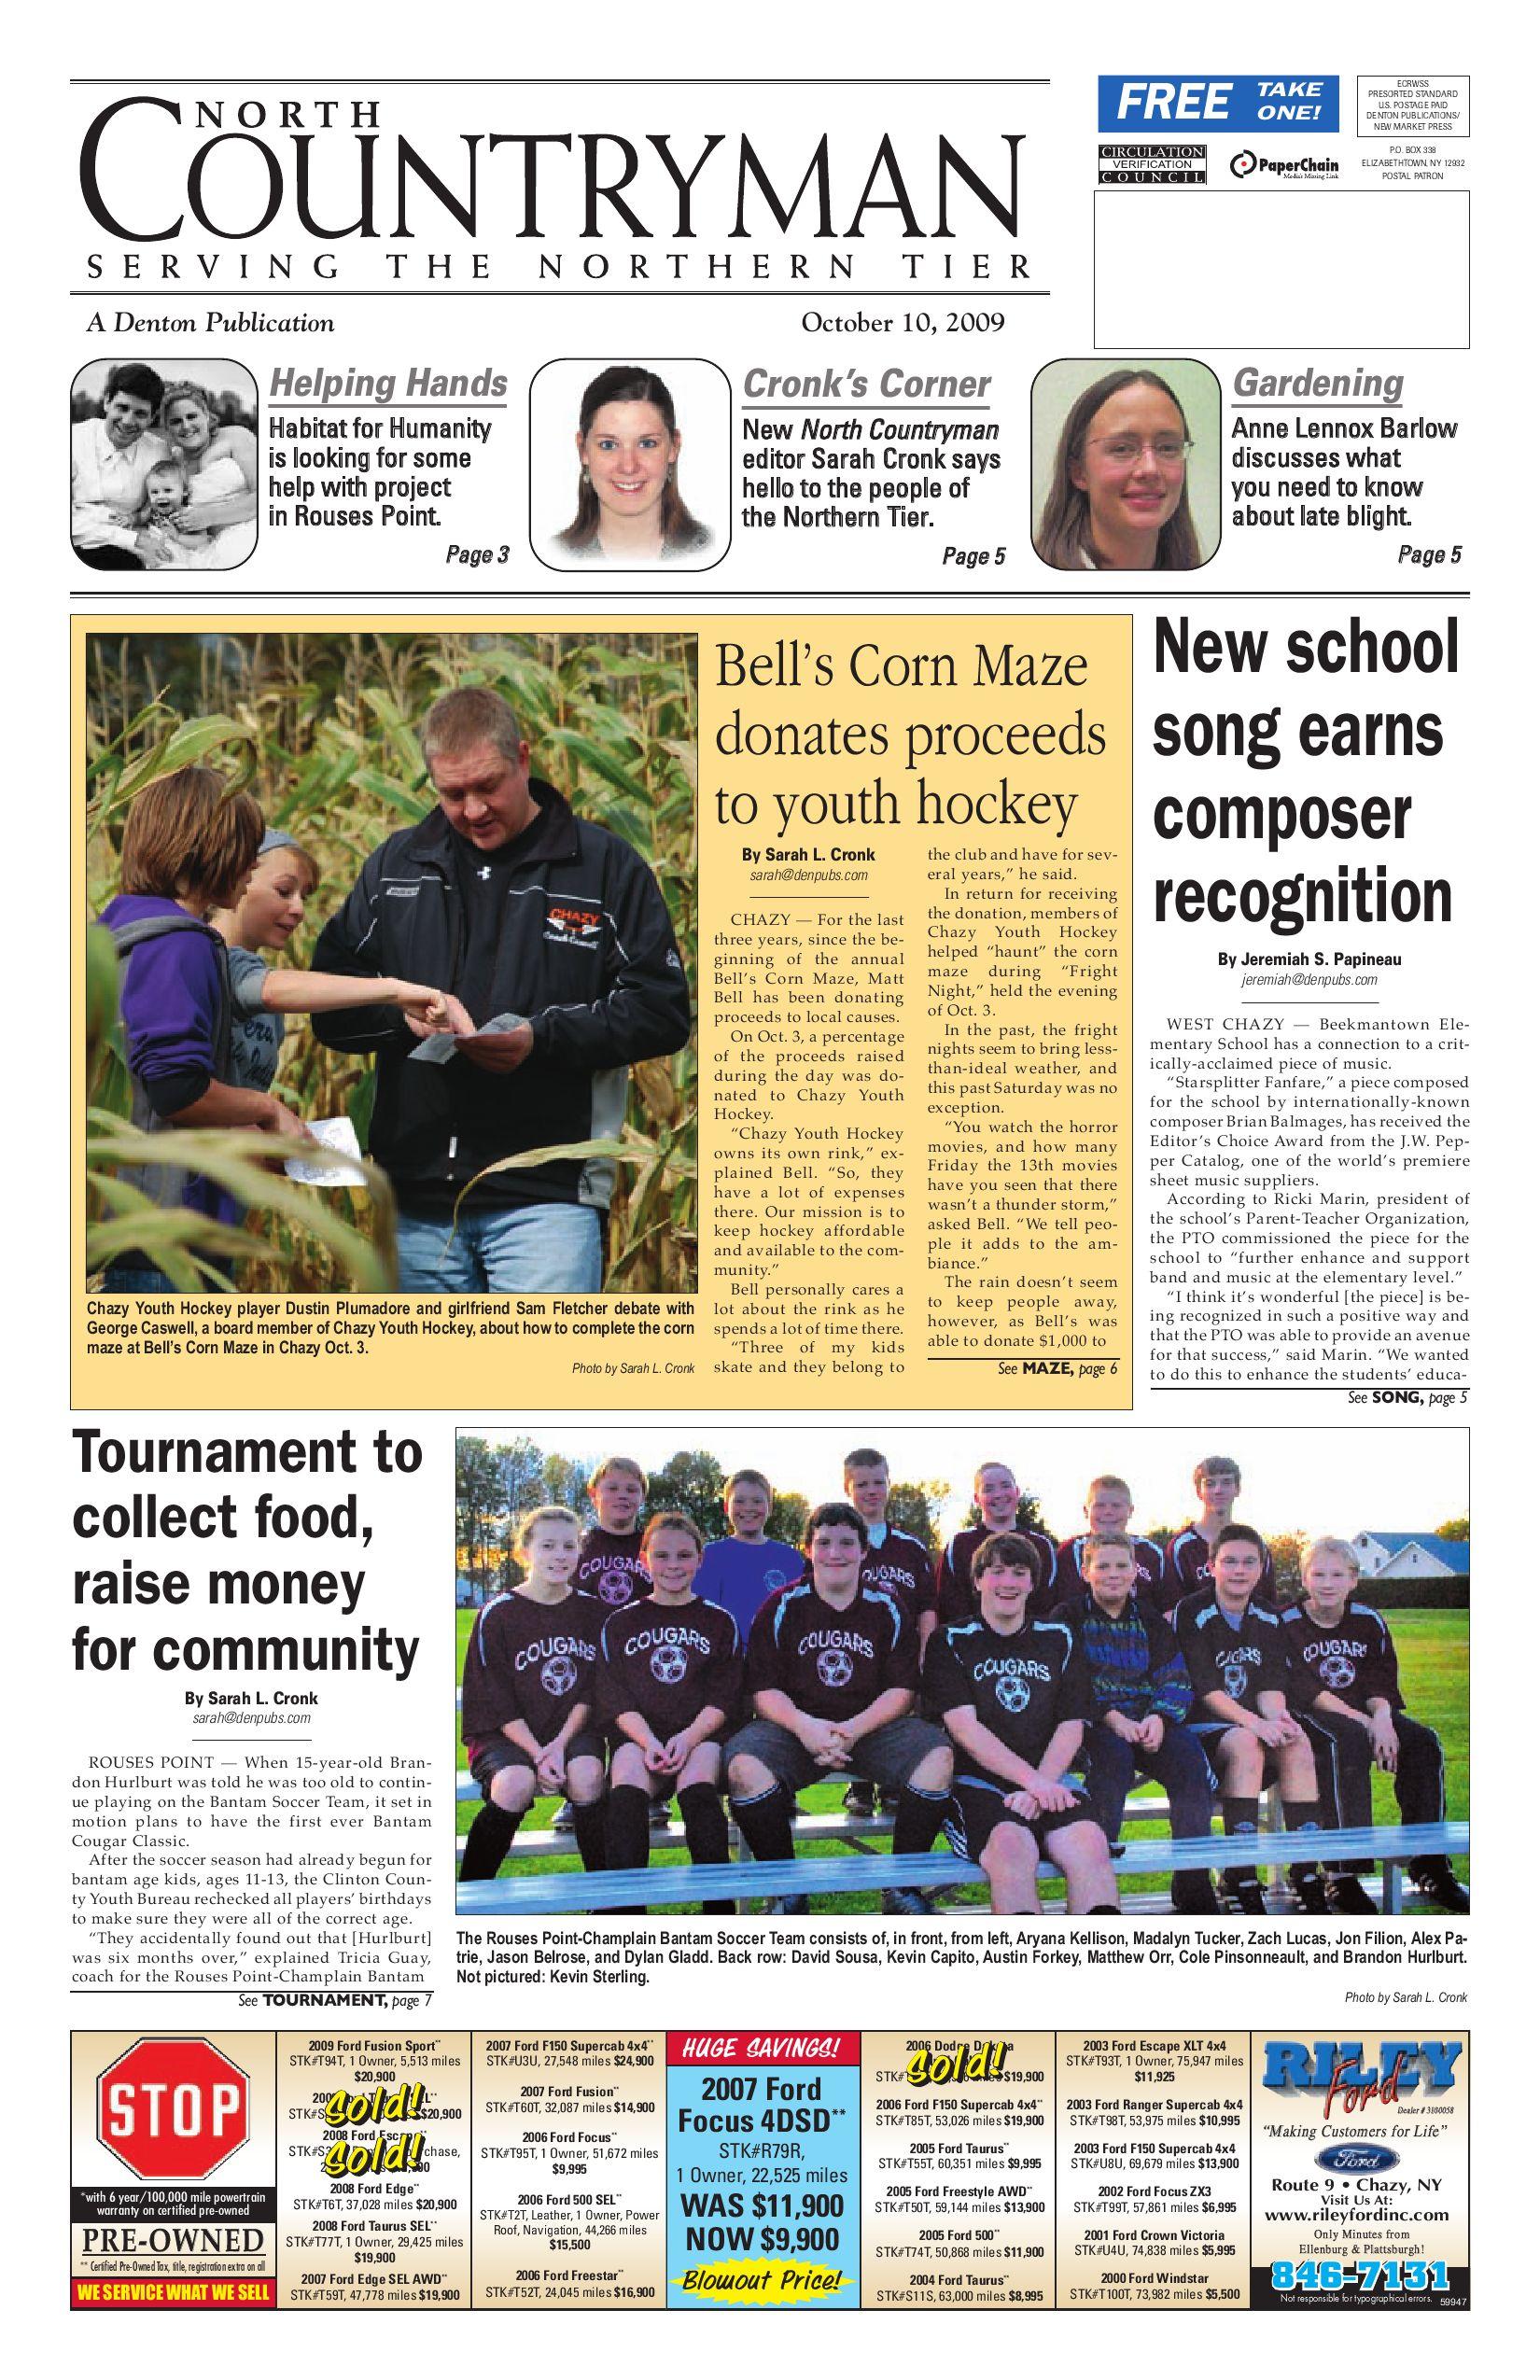 North Countryman 10 10 09 by Sun munity News and Printing issuu